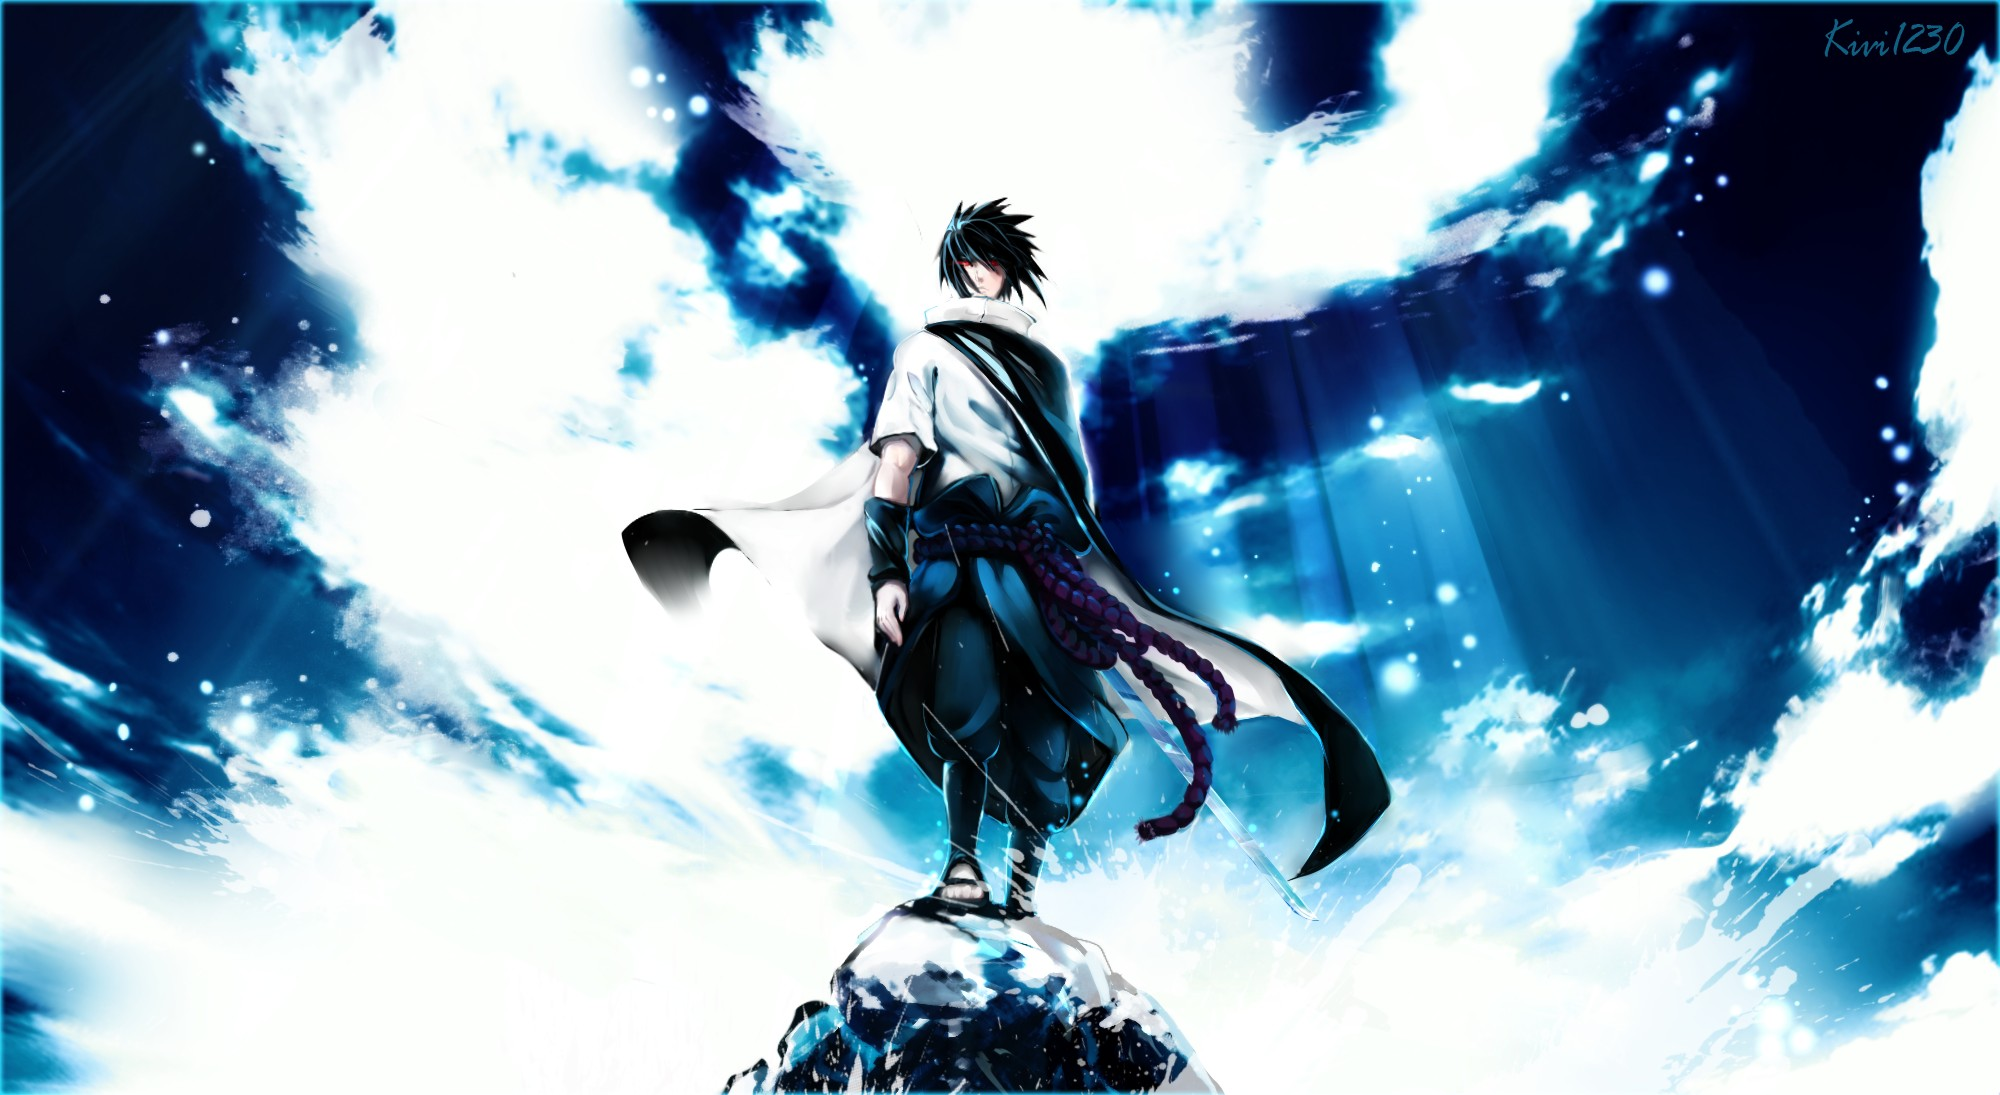 688 Sasuke Uchiha HD Wallpapers  Background Images